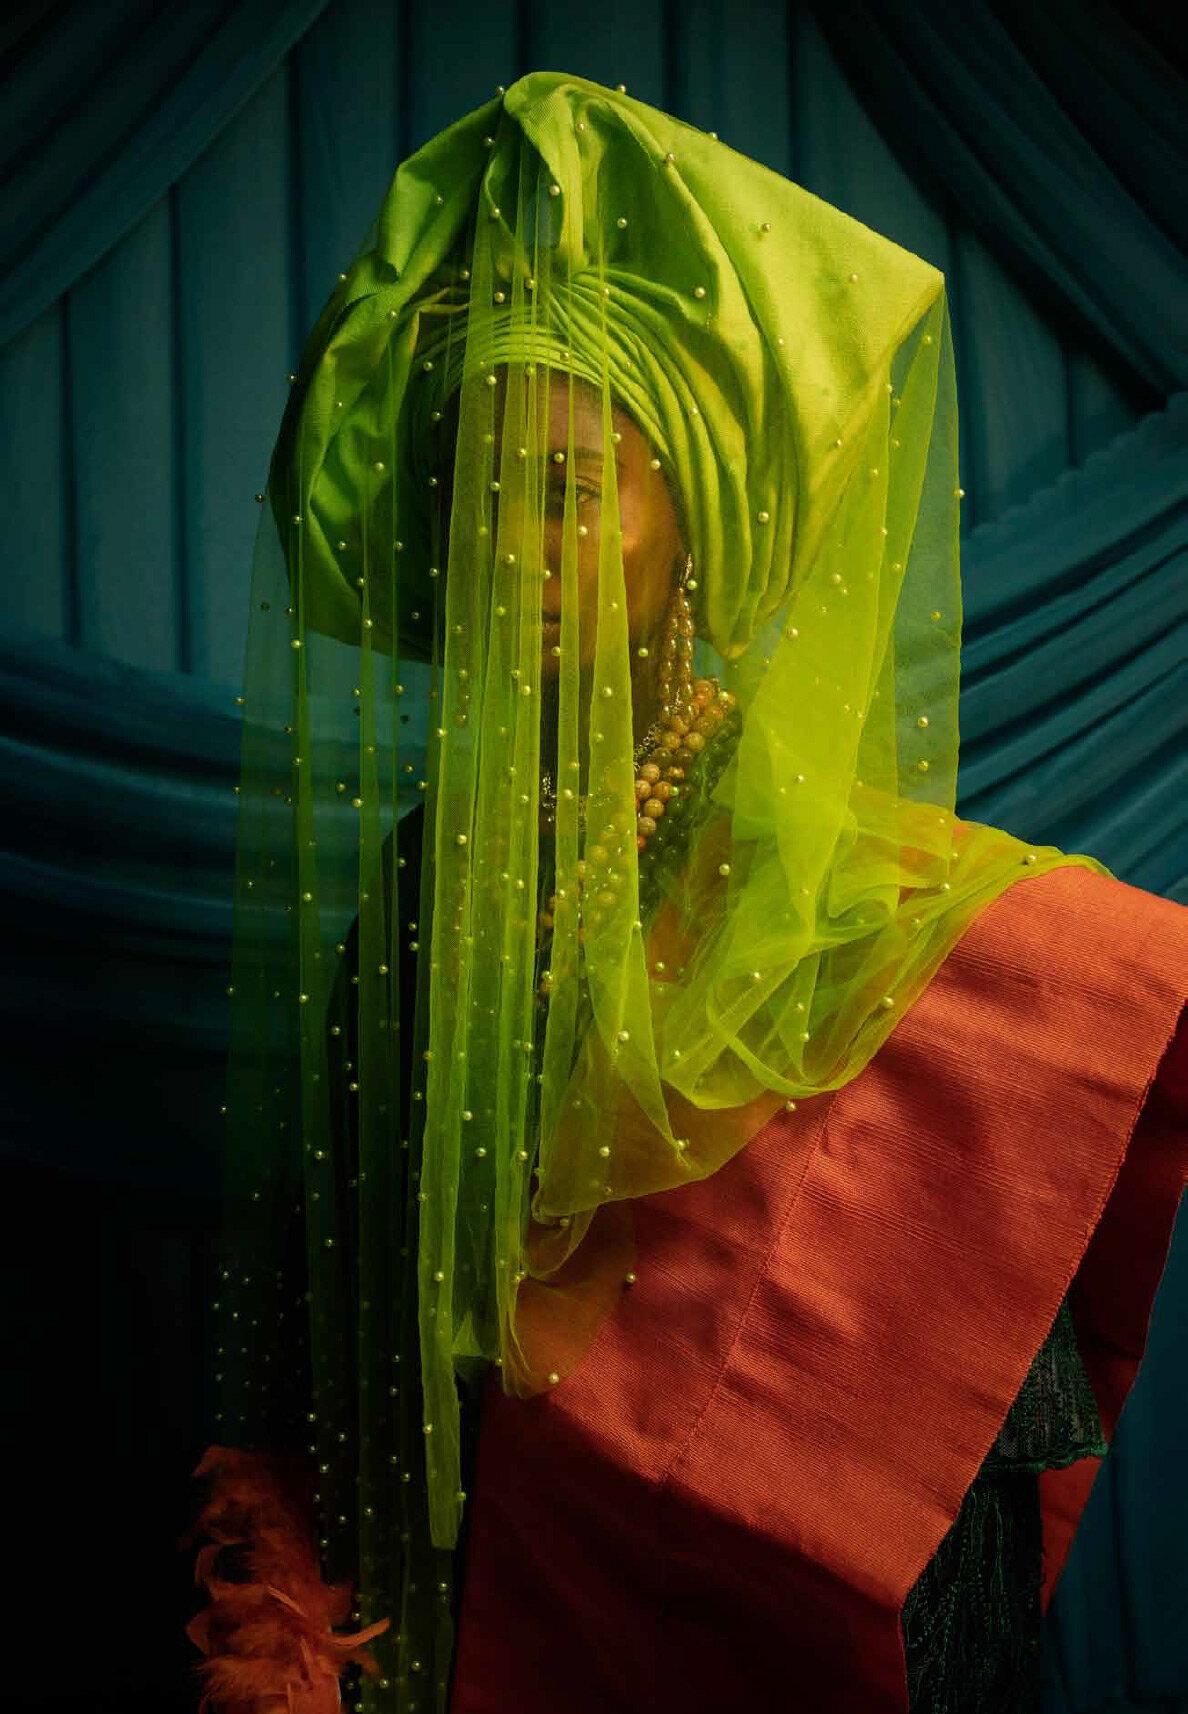 All photographs by Lakin Ogunbanwo. Courtesy of Niki Cryan Gallery